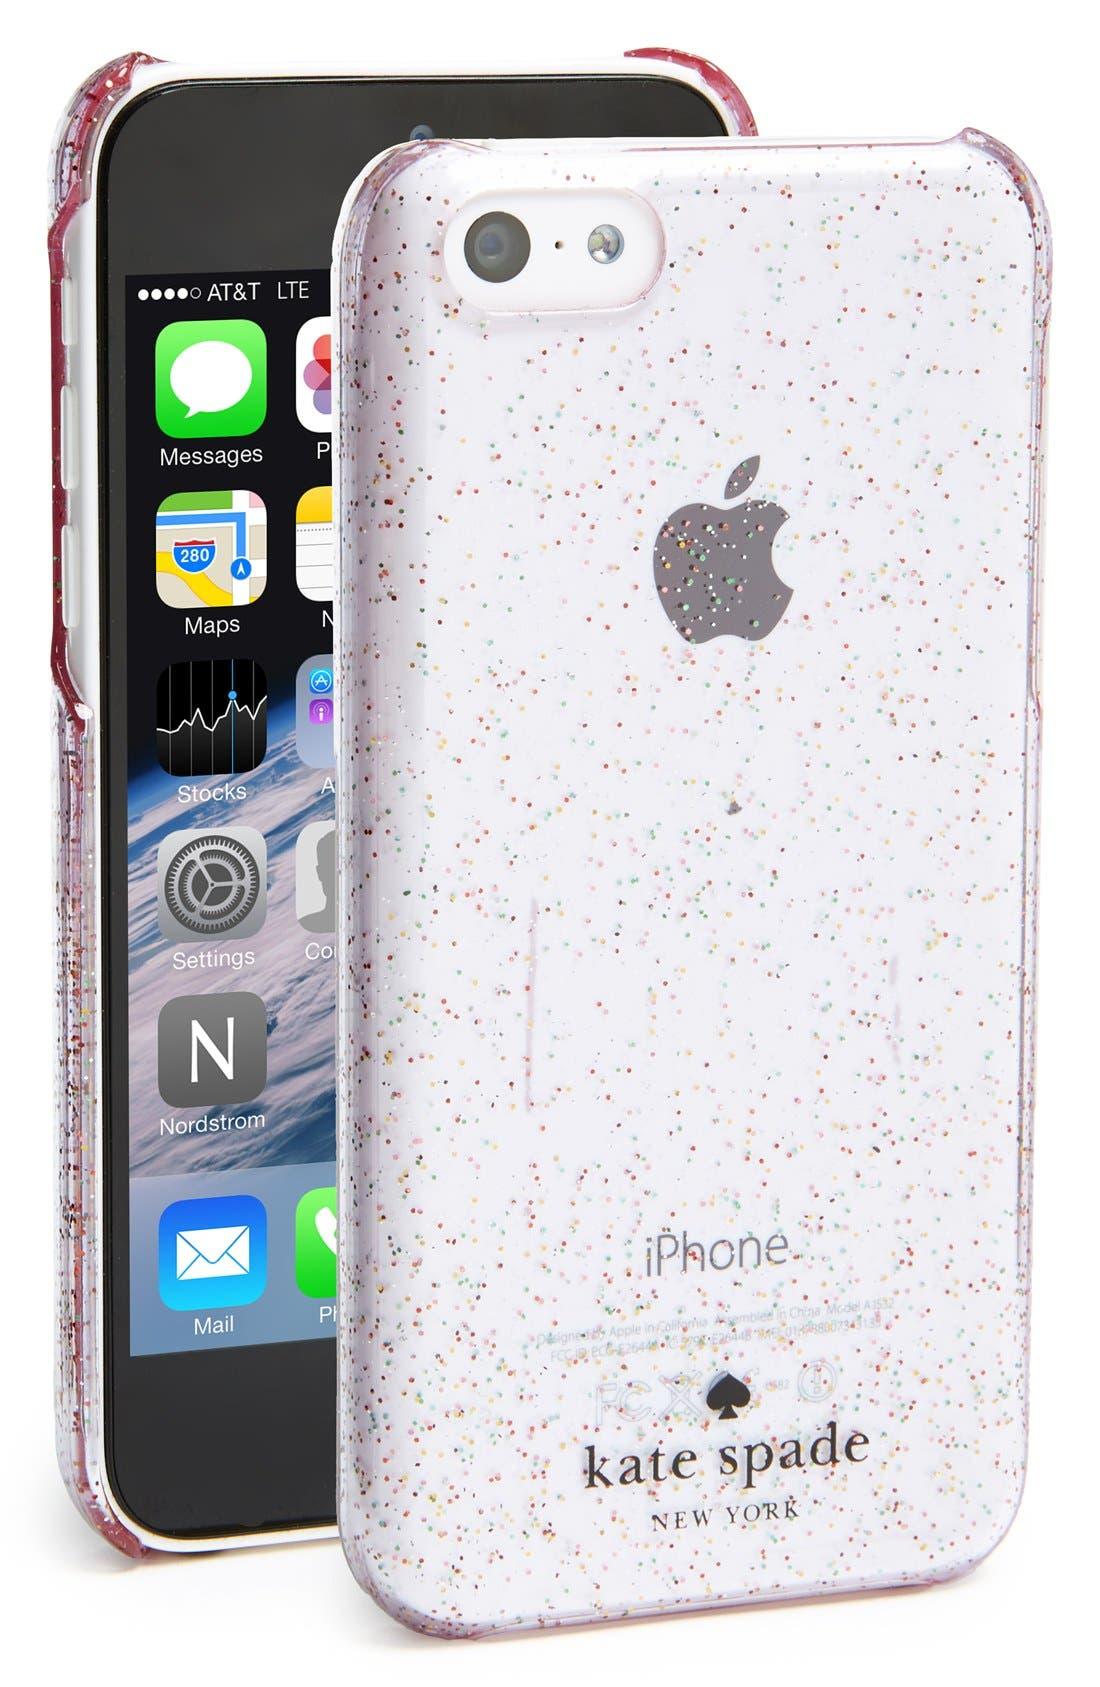 Main Image - kate spade new york 'glitter' iPhone 5c case